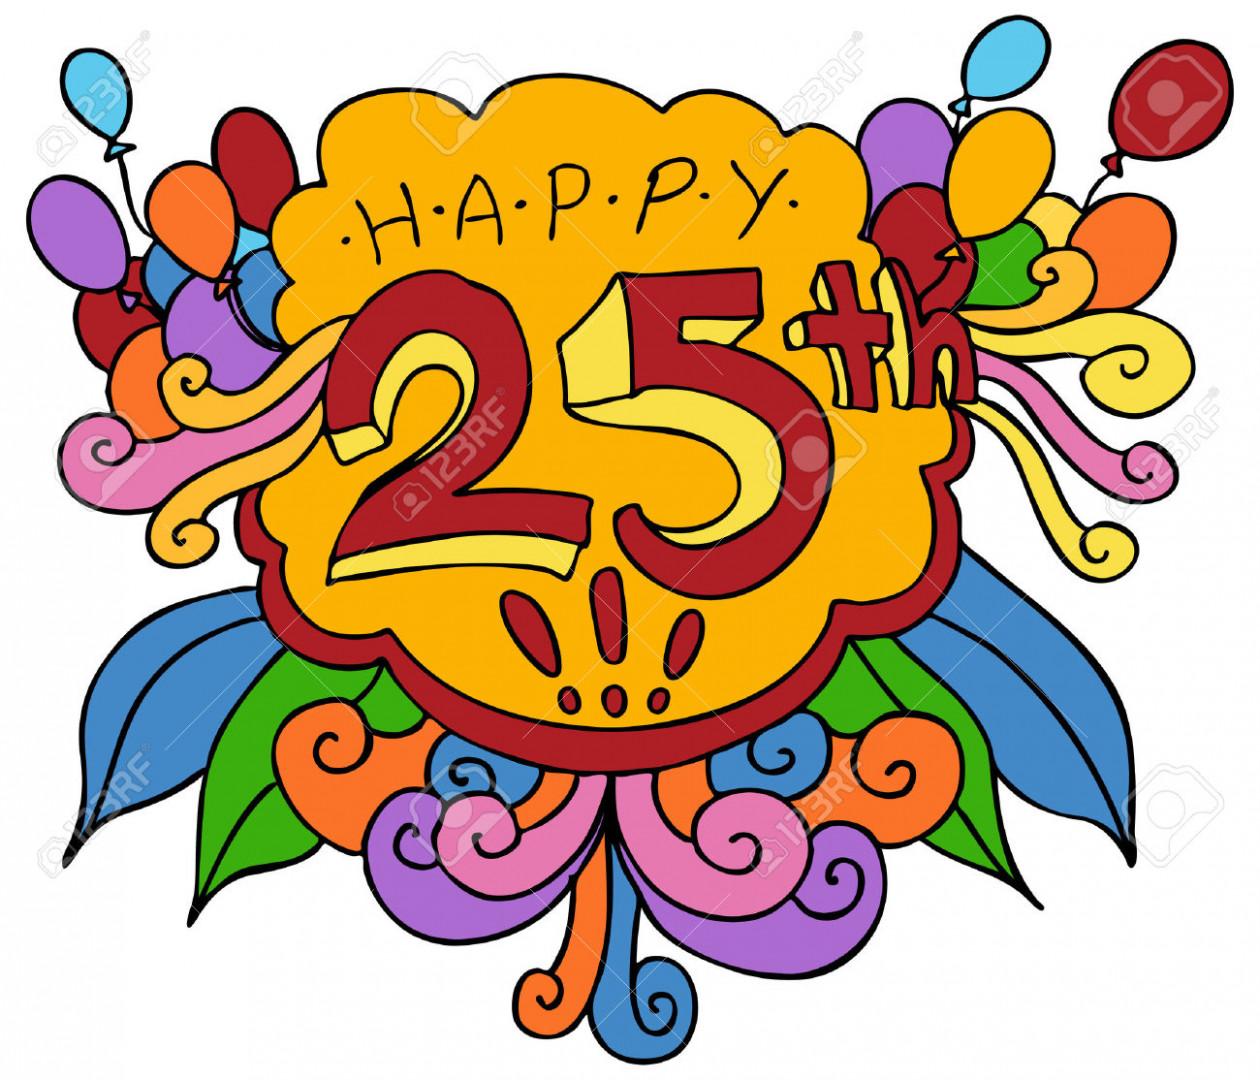 1260x1080 Download Work Anniversary Cartoons Imagesgreeting.website